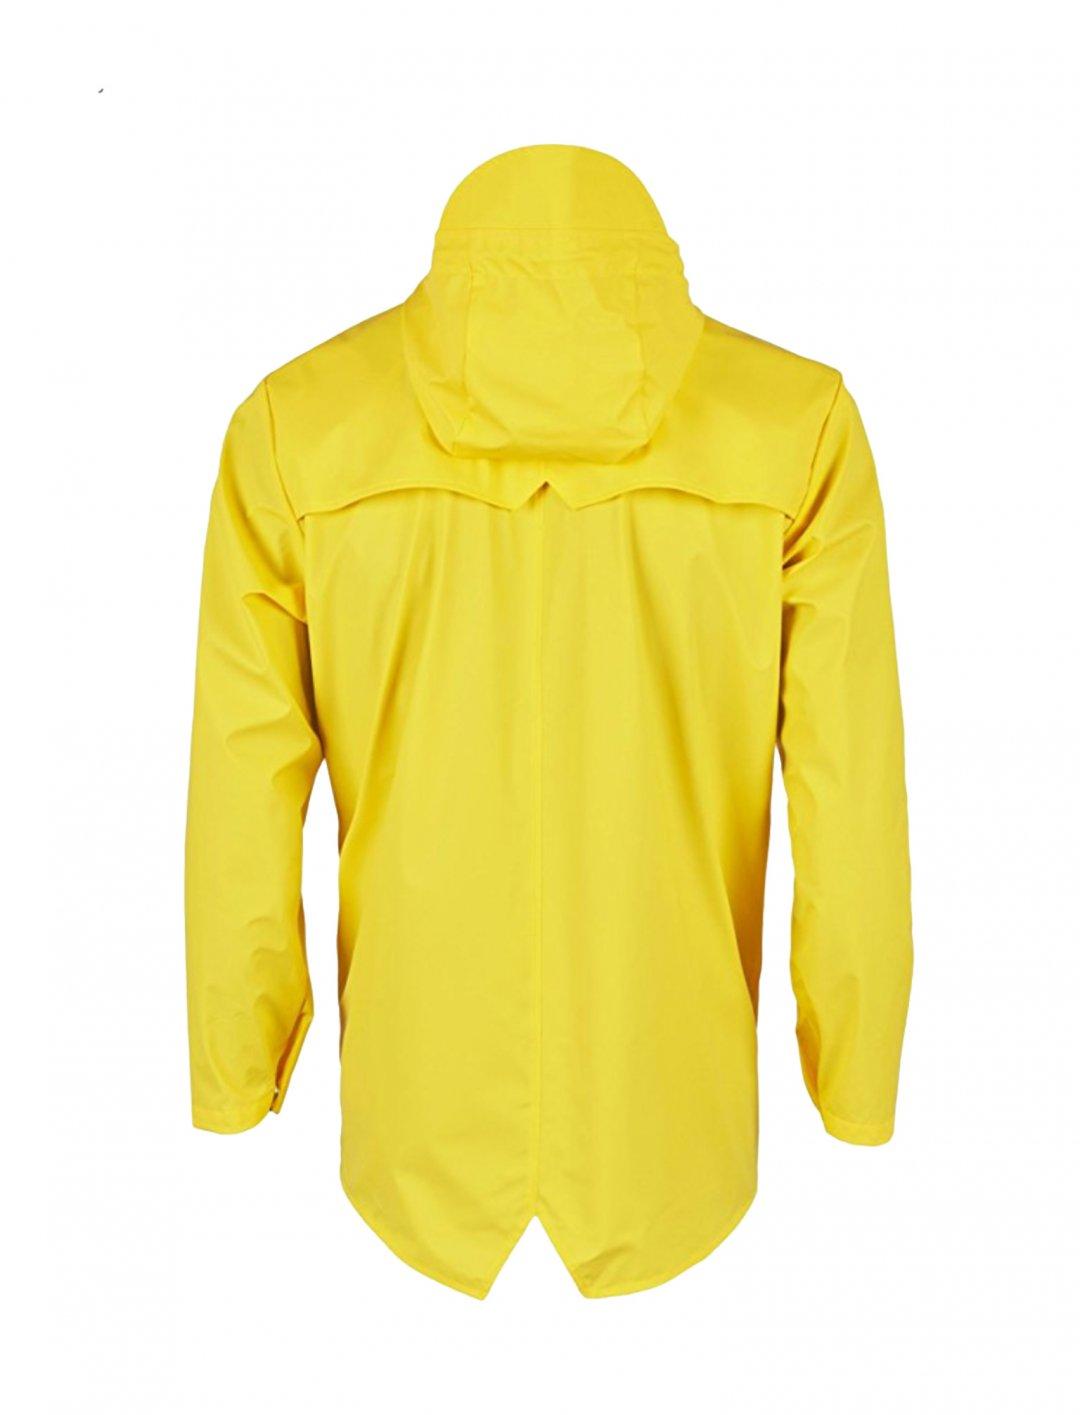 "Rains Jacket Raincoat {""id"":5,""product_section_id"":1,""name"":""Clothing"",""order"":5} Rains"